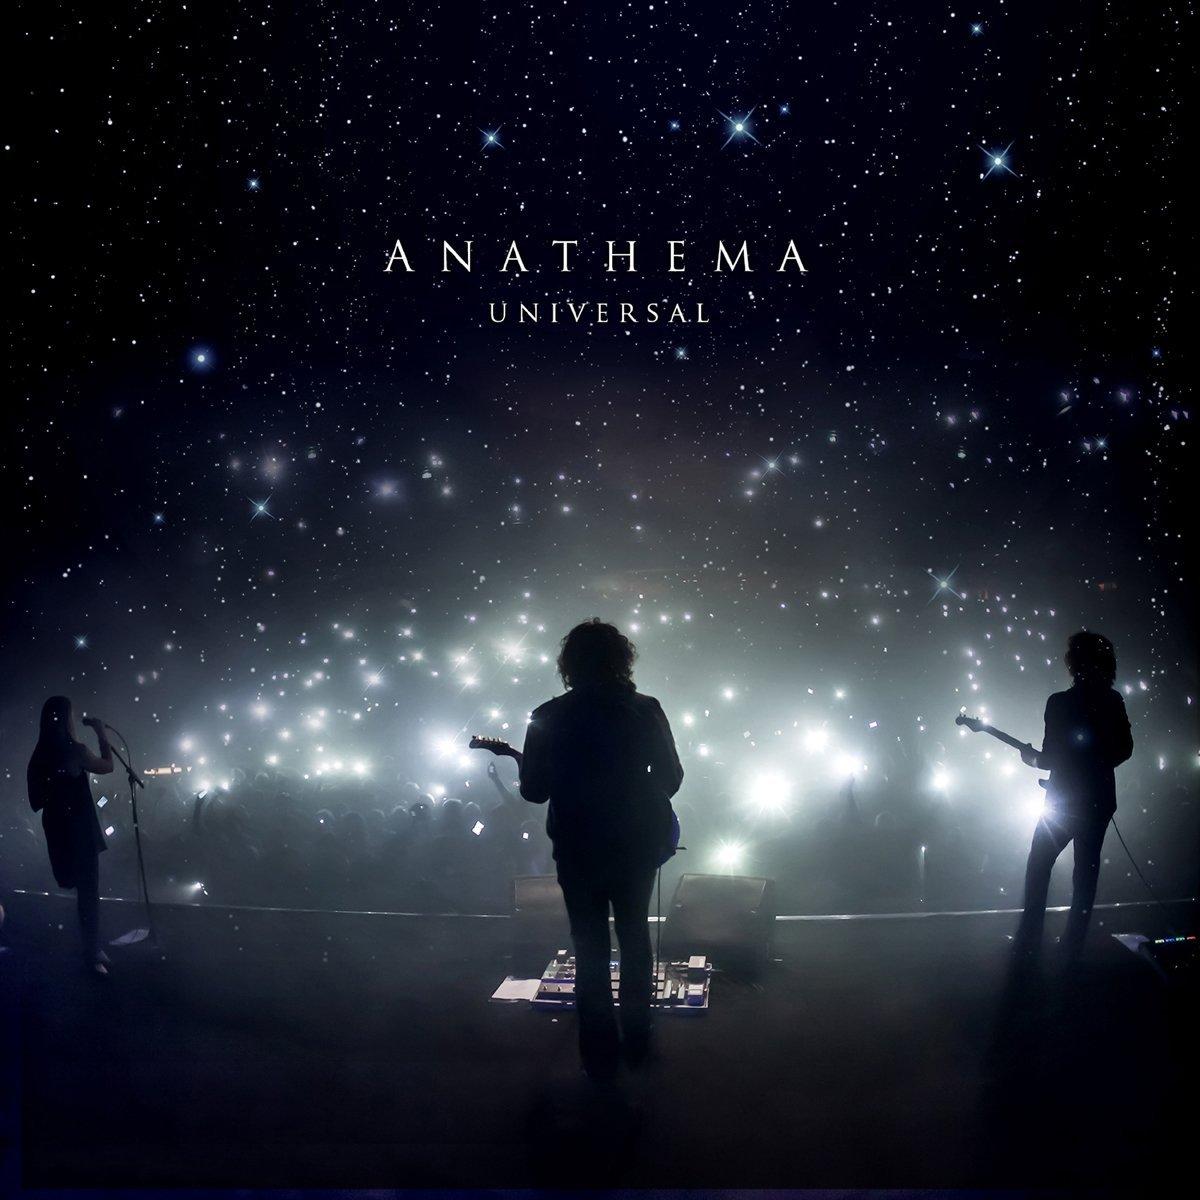 Anathema: Universal (2013) Book Cover